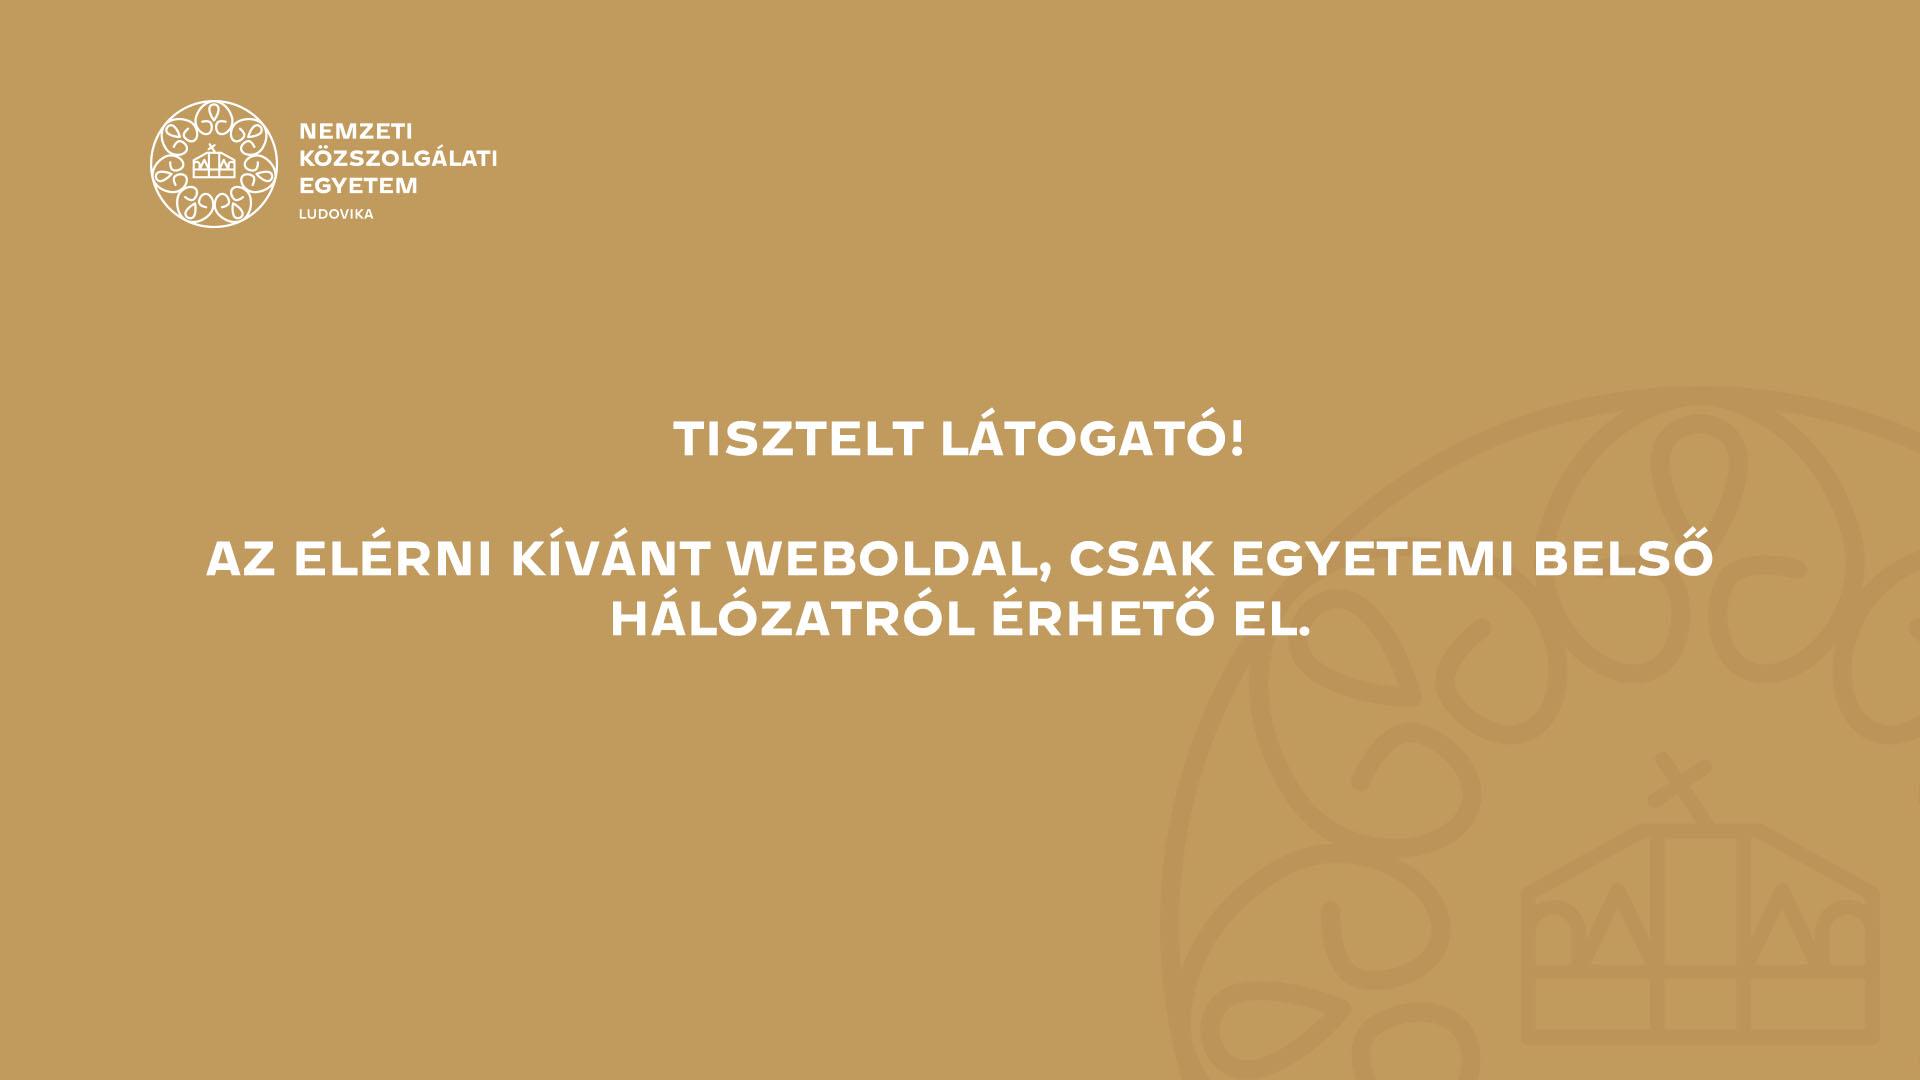 Prof. Dr. Kóródi Gyula o.tű. alezredes PhD.